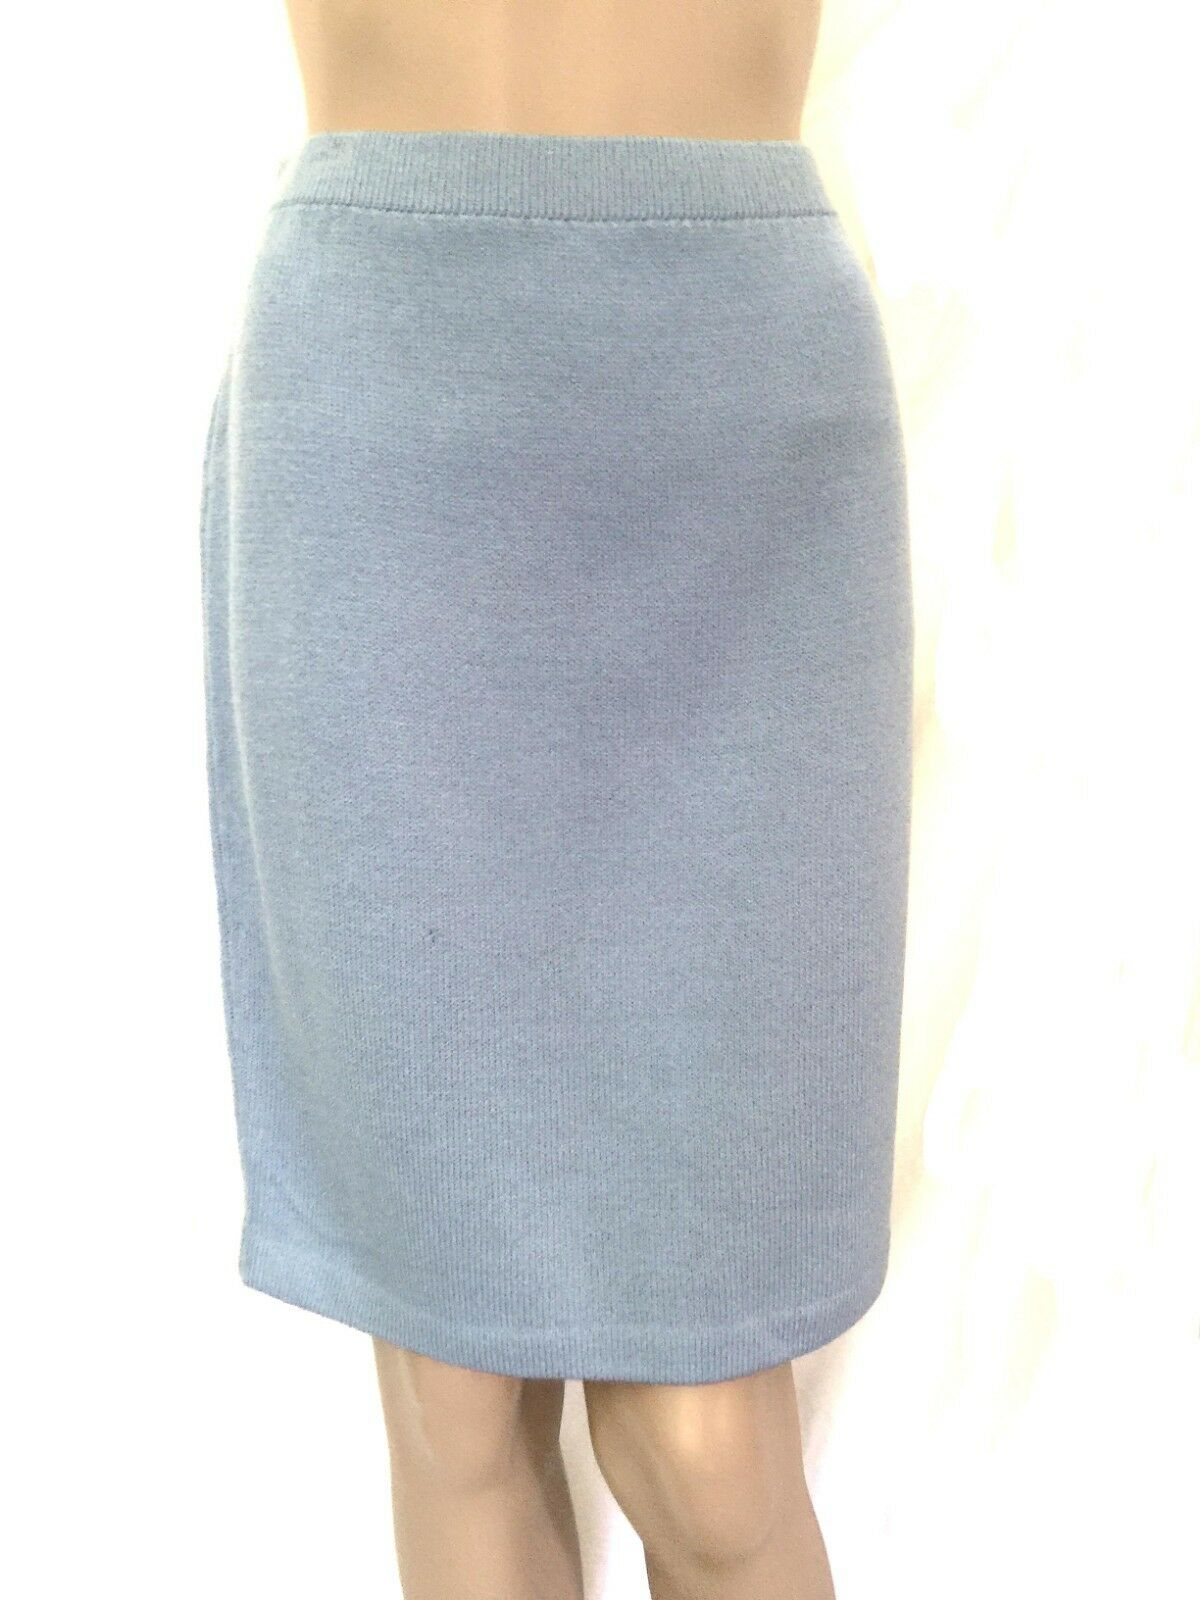 St. John Collection bluee Santana Knee Length Skirt - Size 6 - EUC